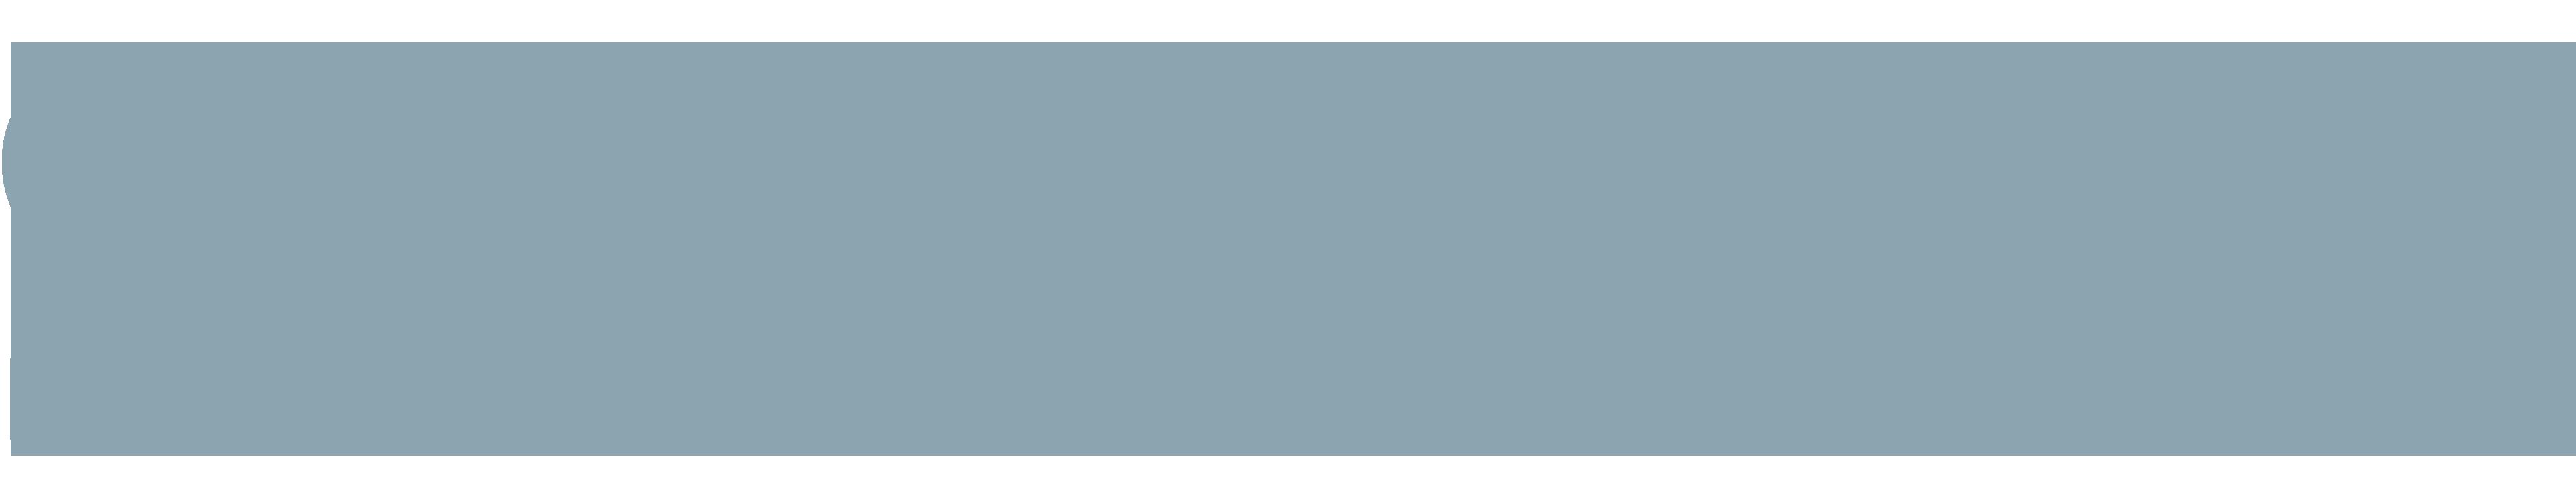 Siemens-Logo-Recovered